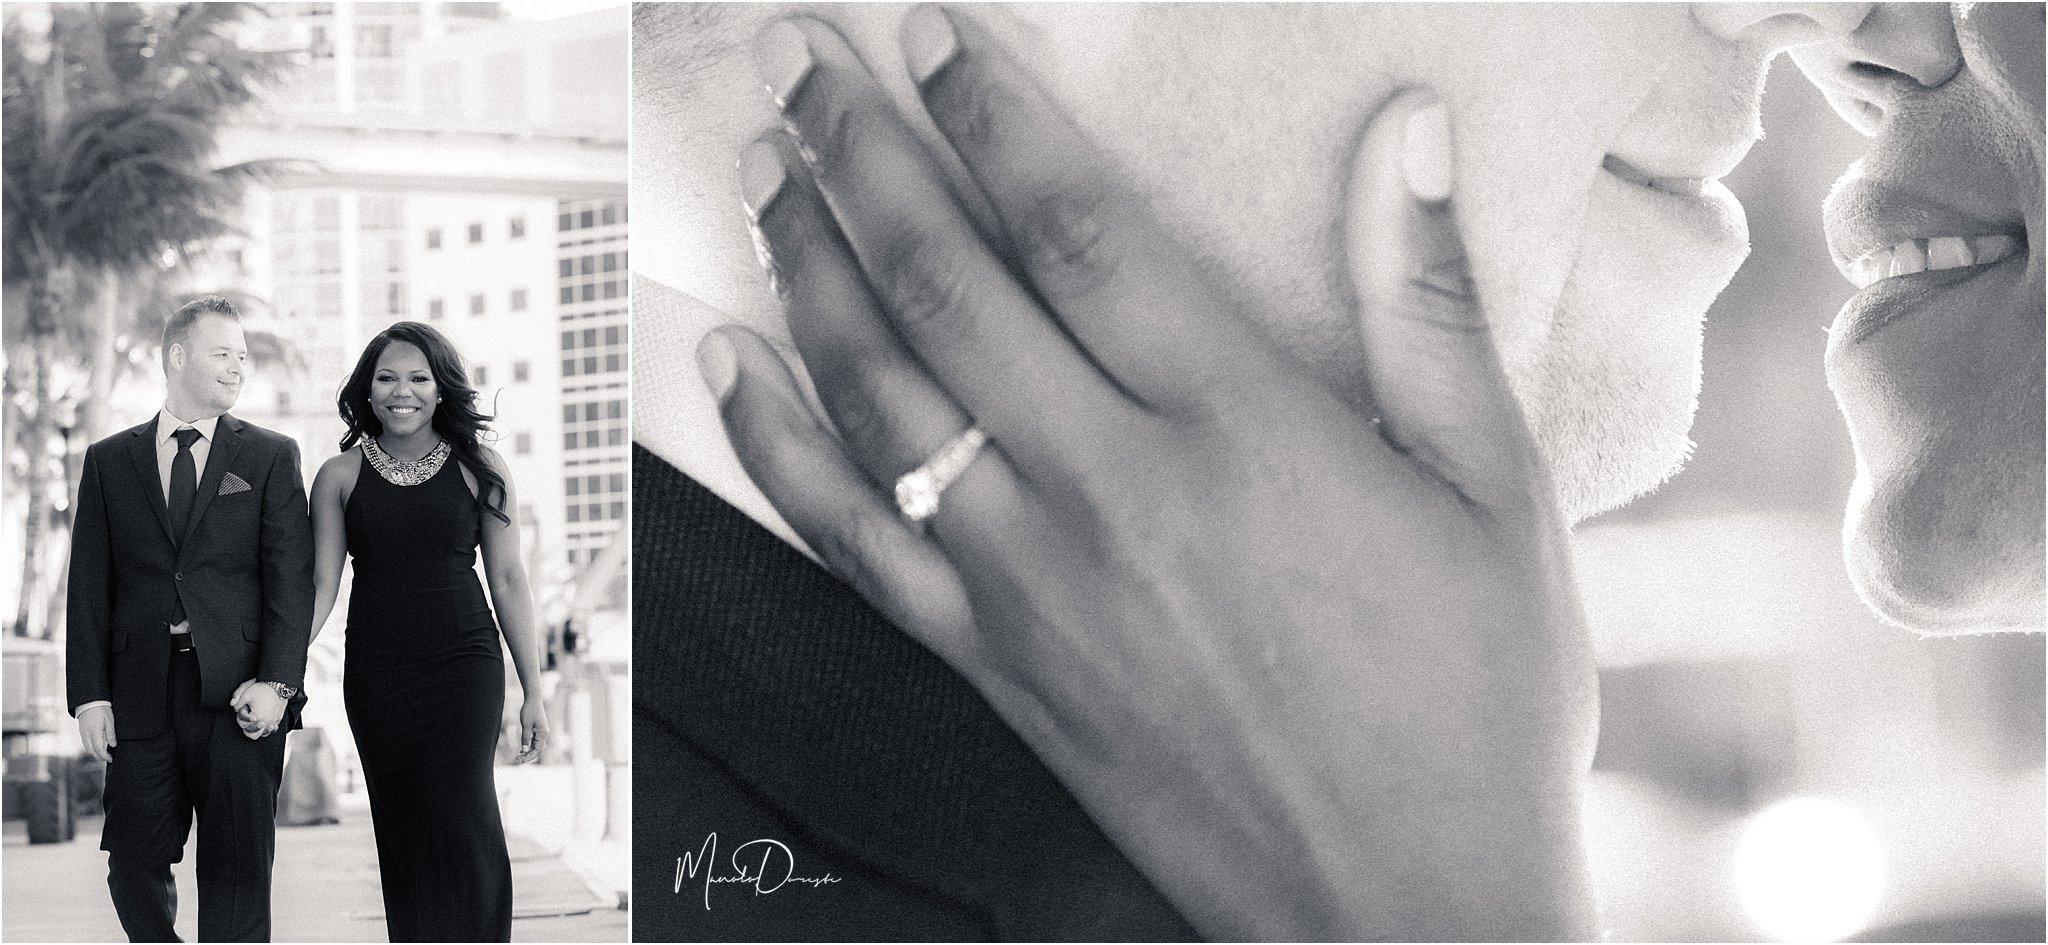 0701_ManoloDoreste_InFocusStudios_Wedding_Family_Photography_Miami_MiamiPhotographer.jpg